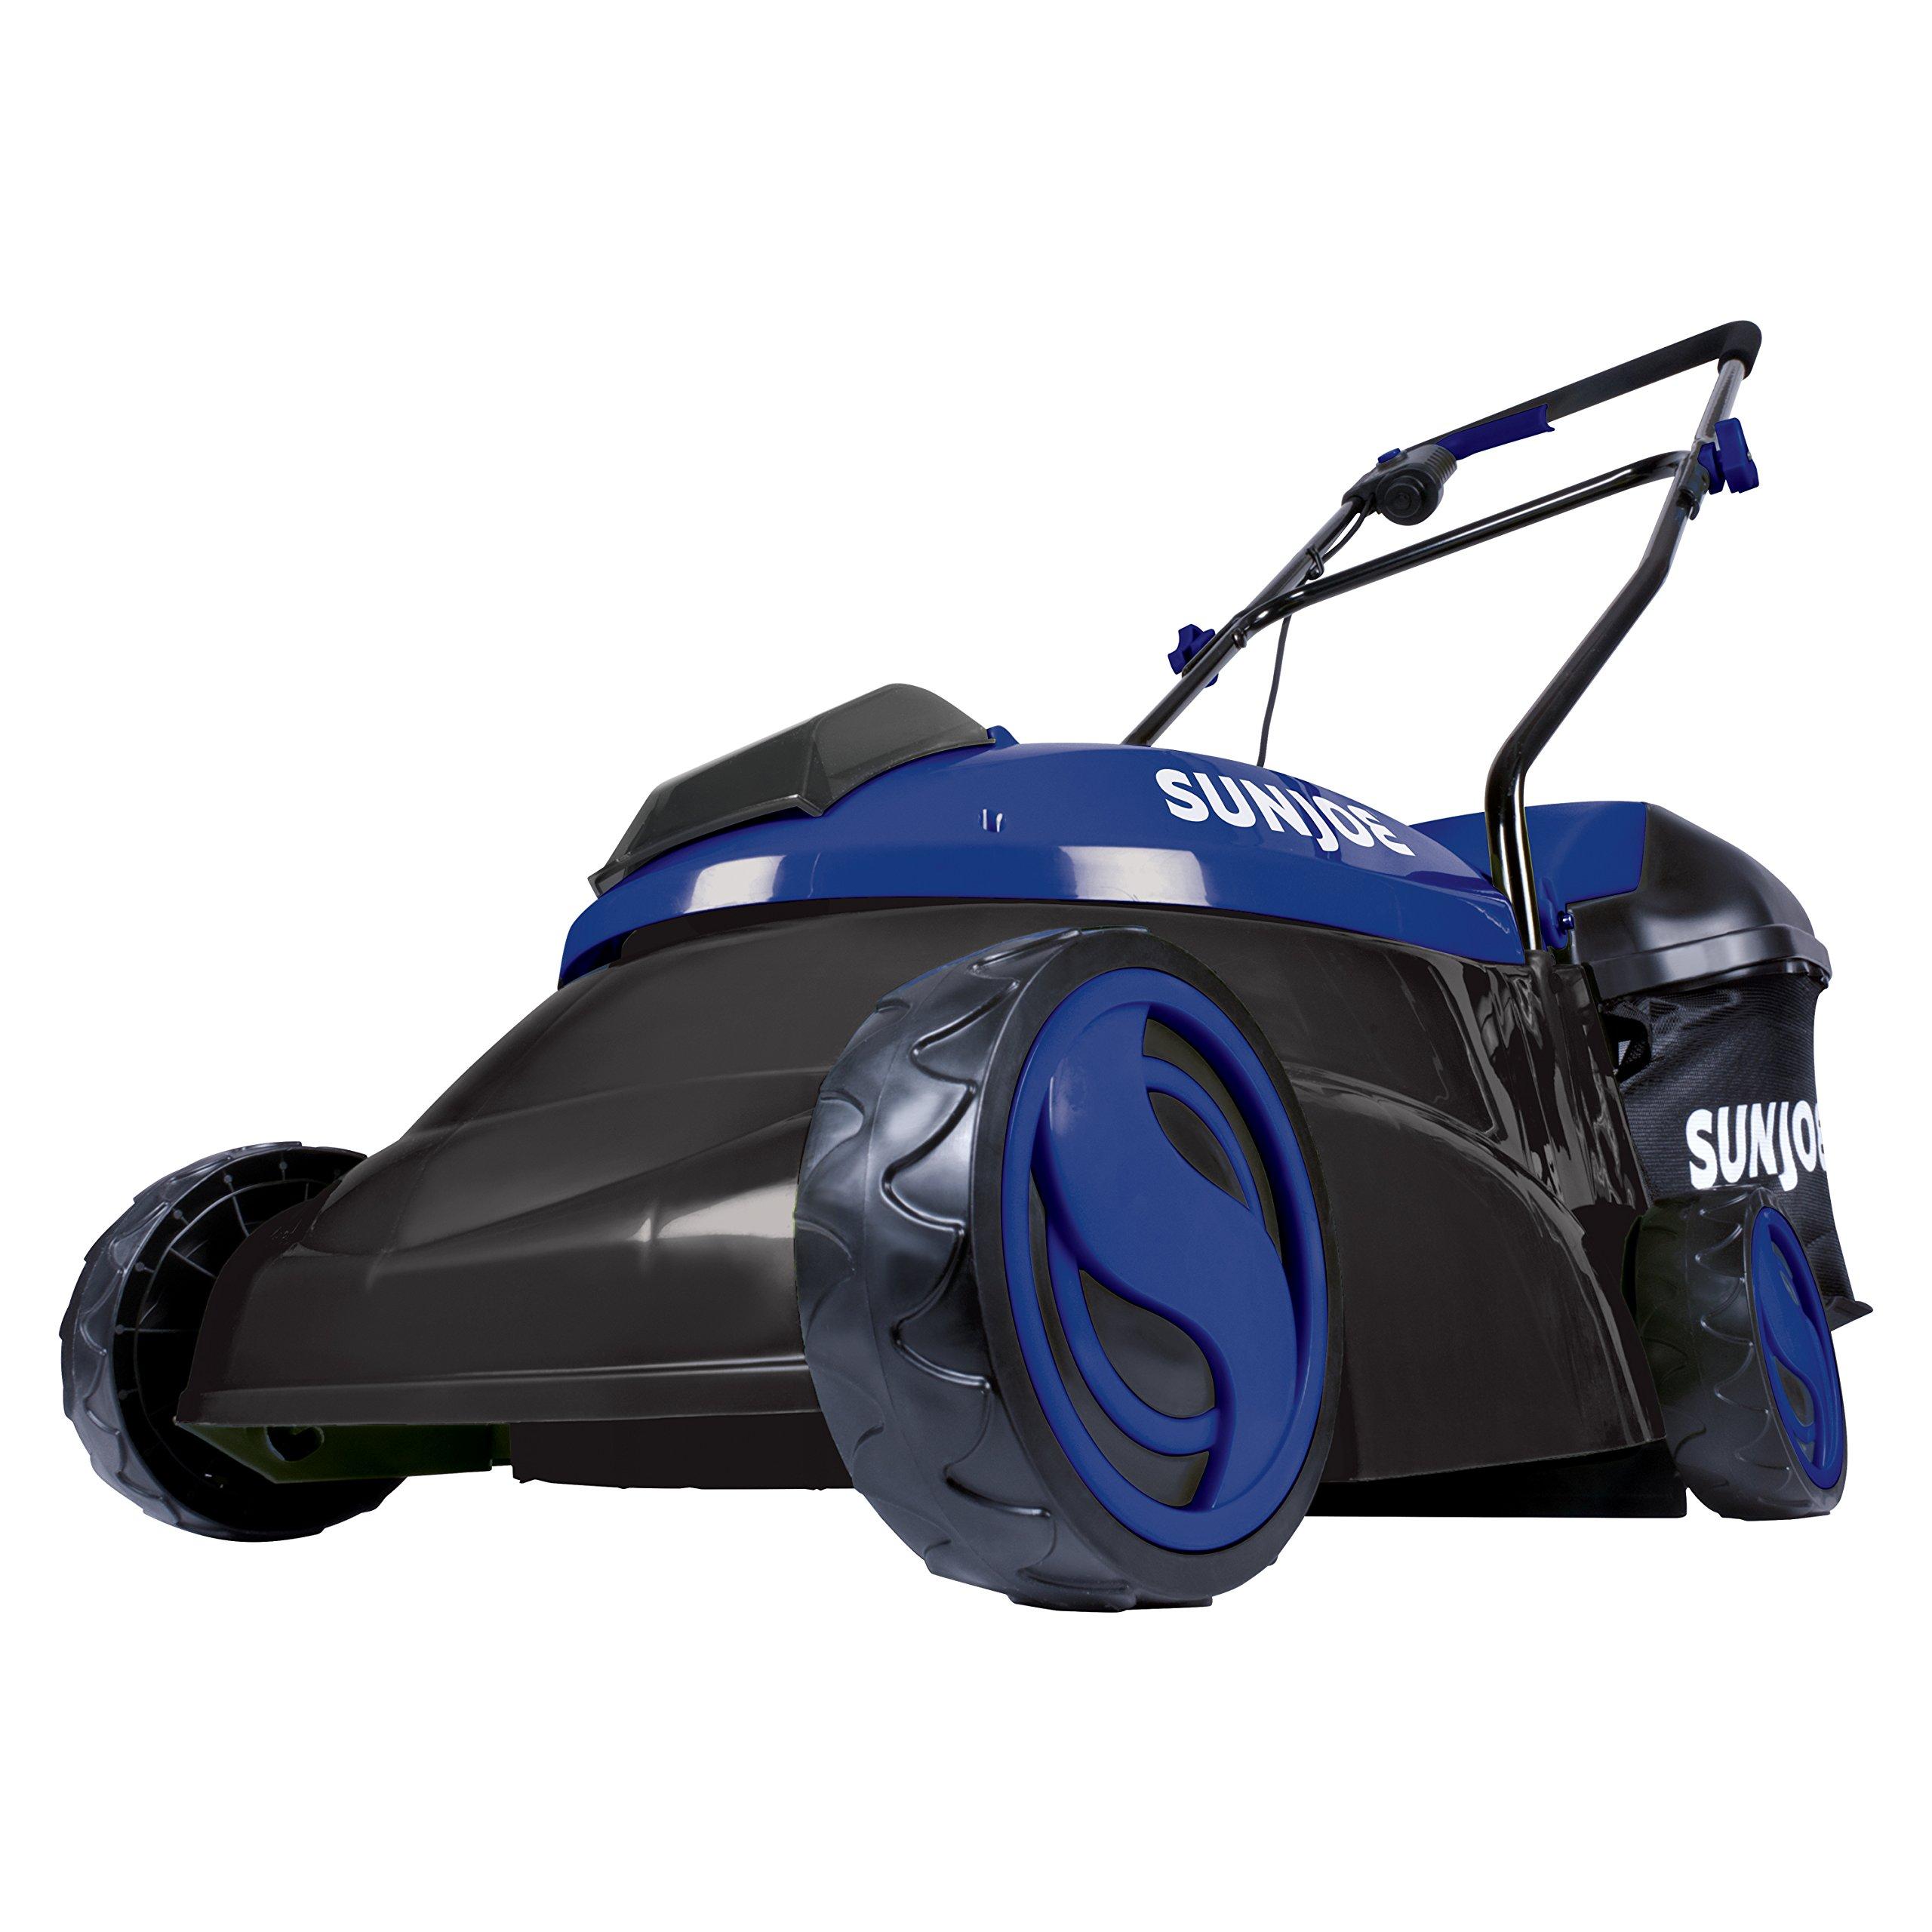 Sun Joe MJ401C-XR-SJB-RM Cordless Lawn Mower   14 inch   28V   5 Ah   Brushless Motor (Certified Refurbished) (Blue)